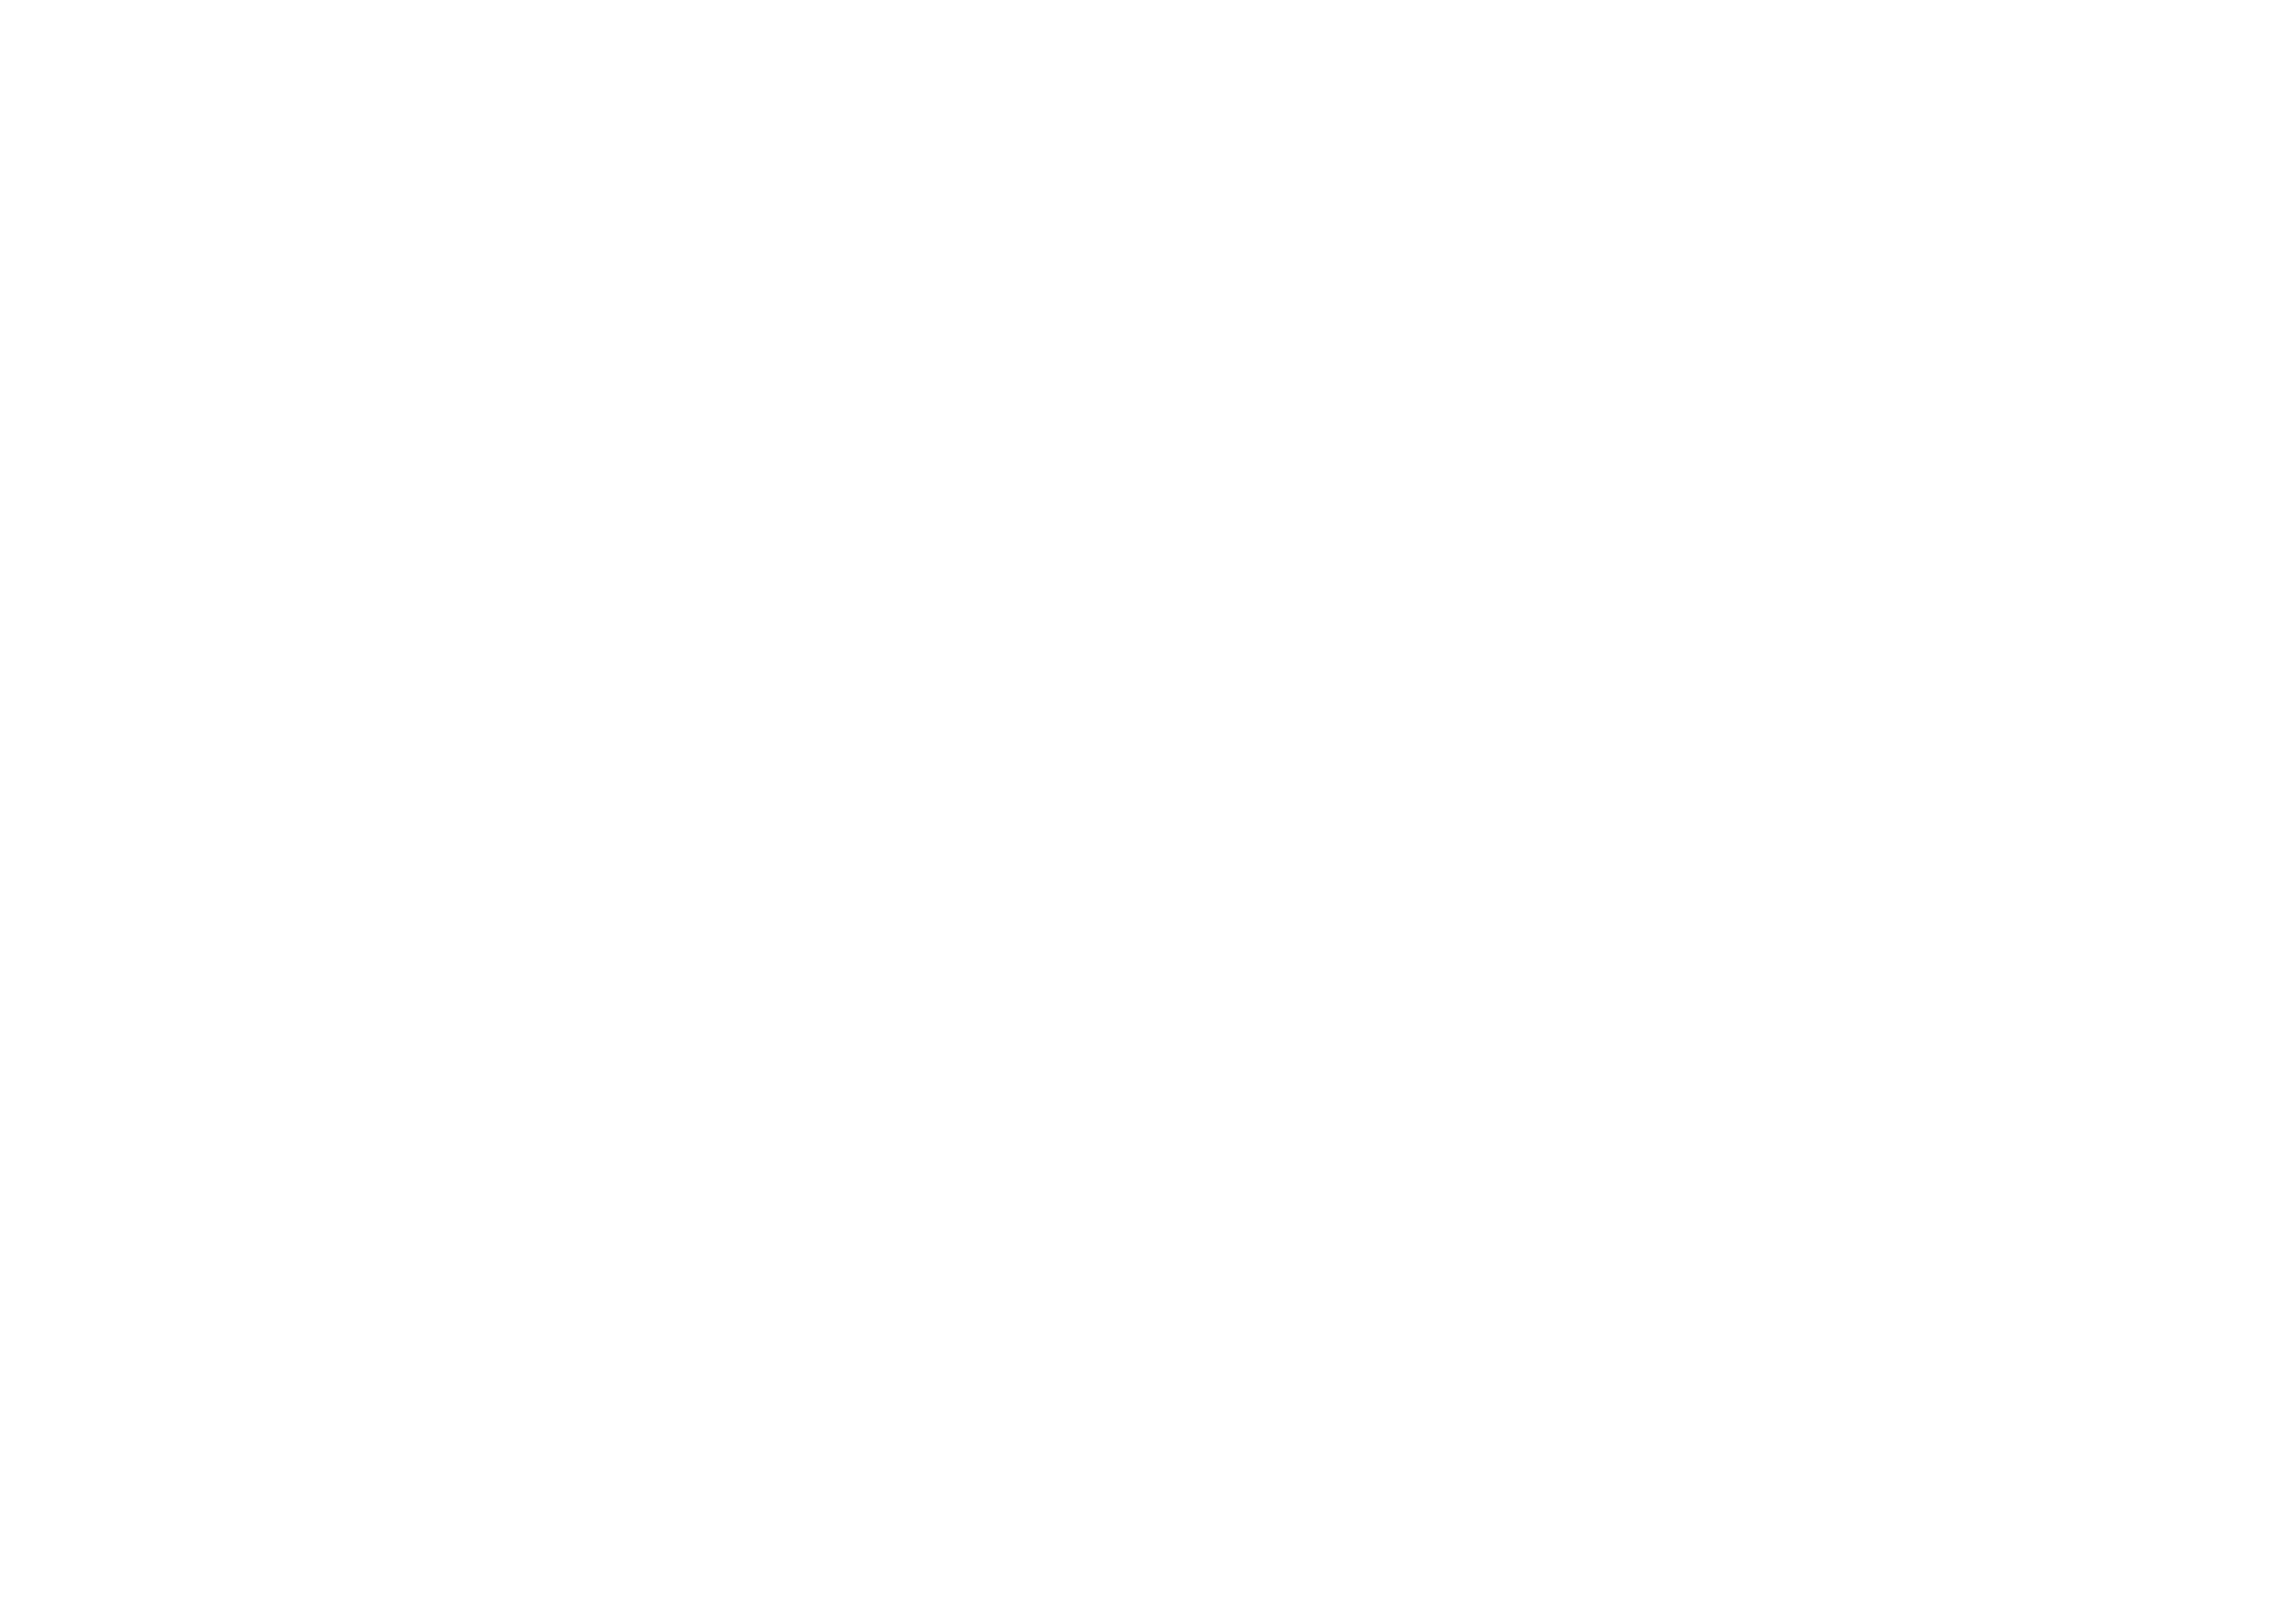 Logo design for public school foundation